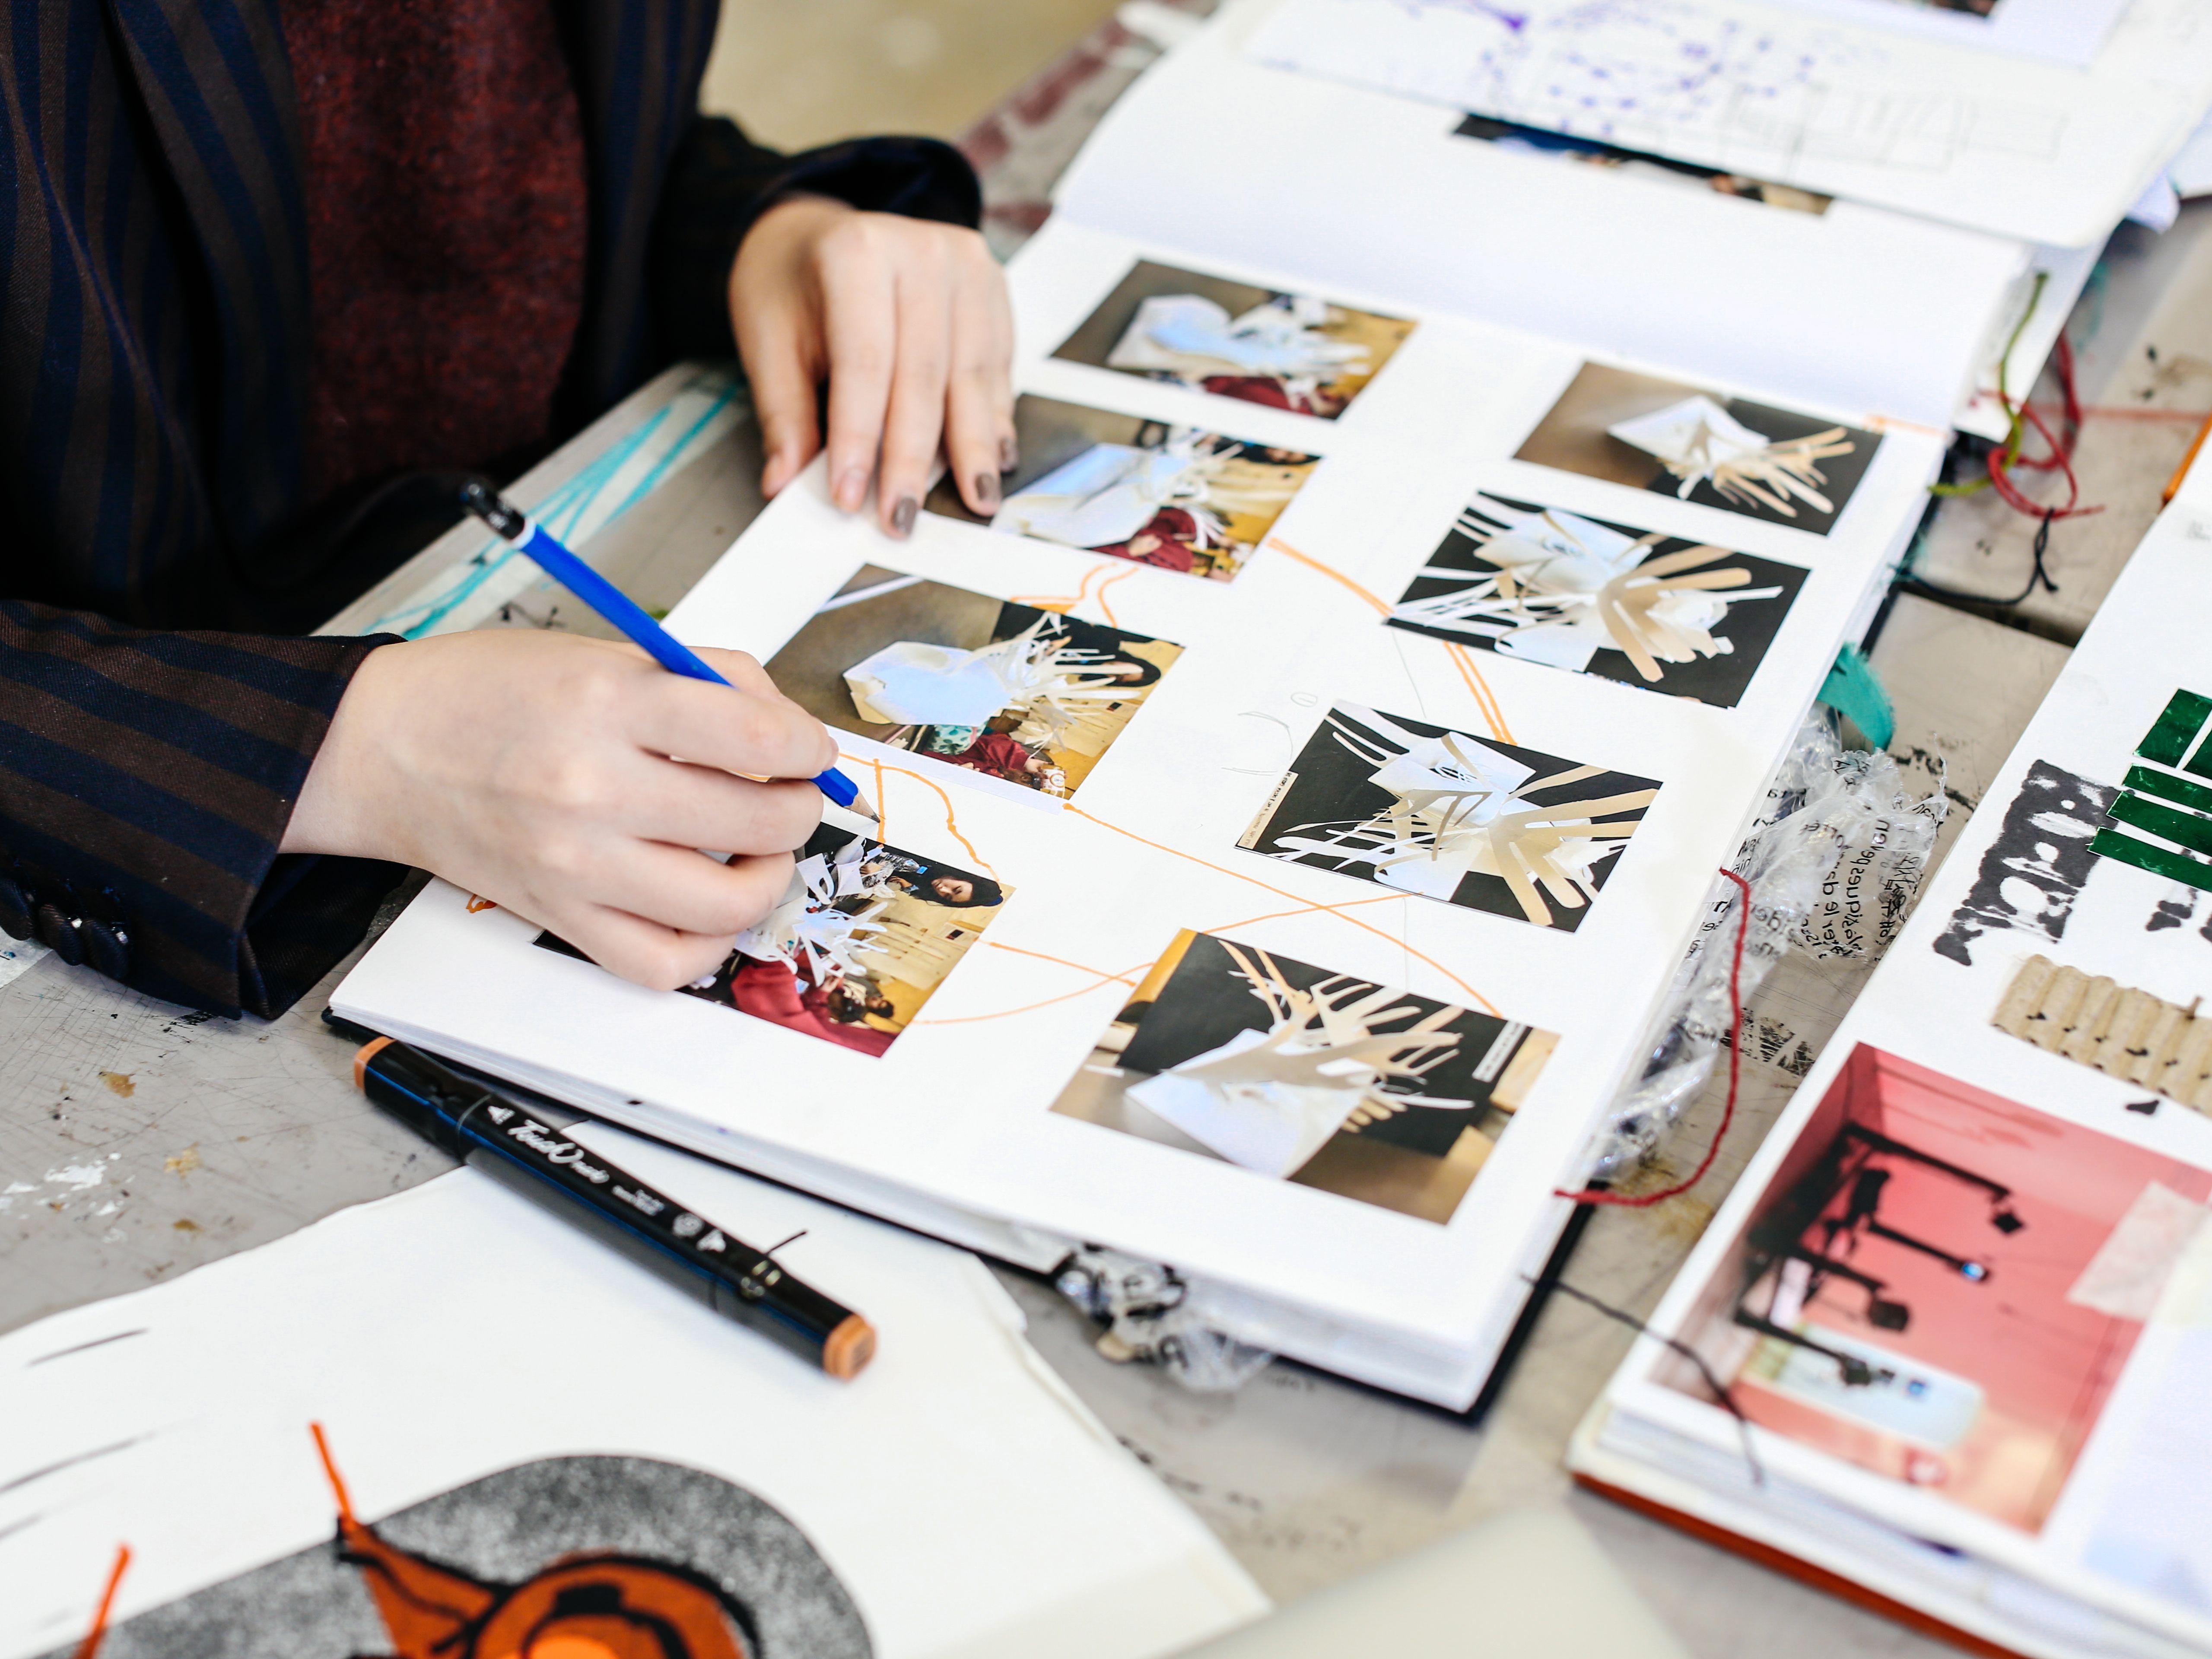 Student working in sketchbook